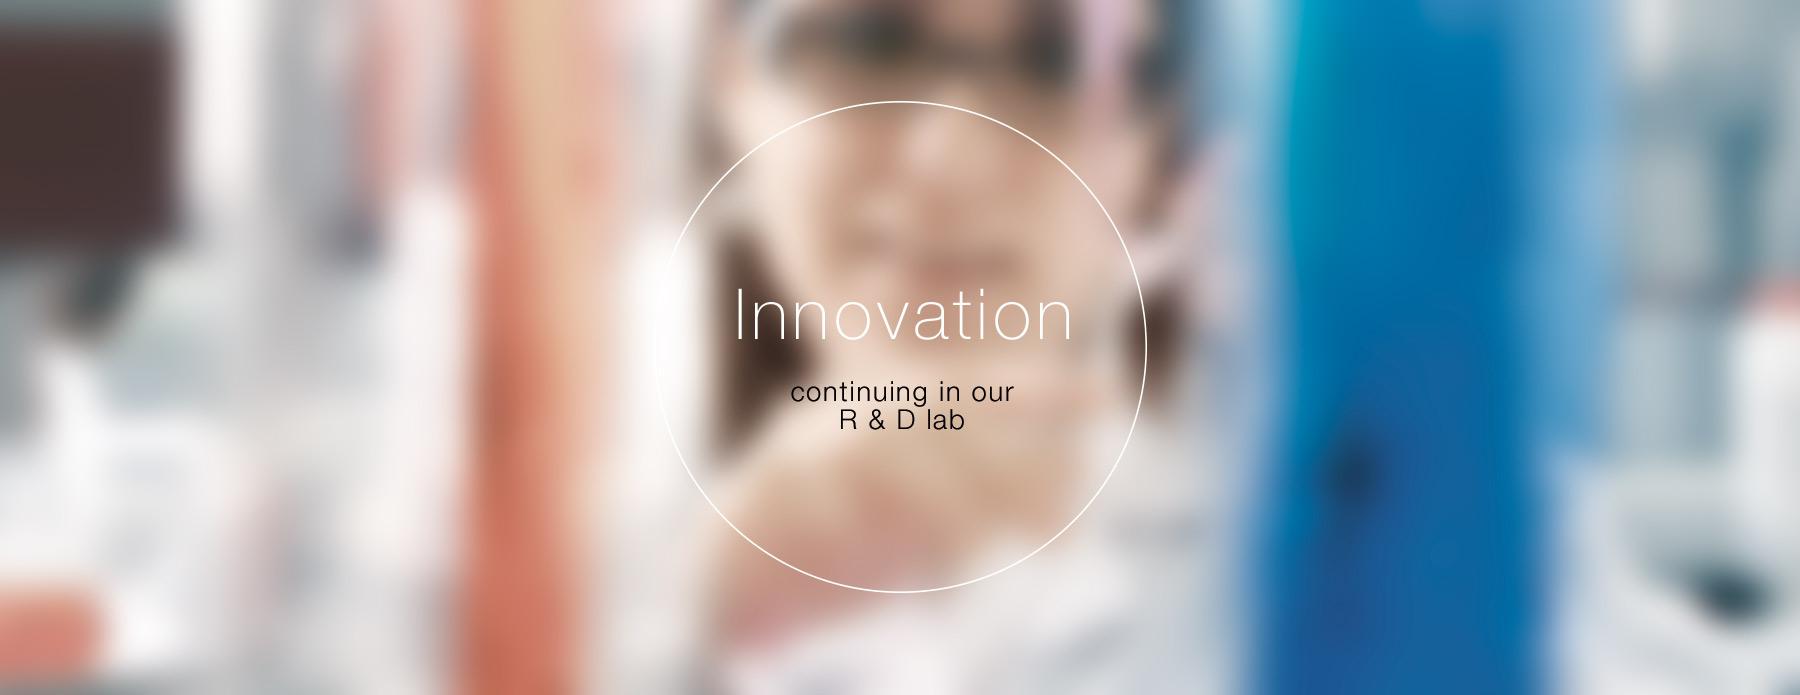 slider-engl-innovation